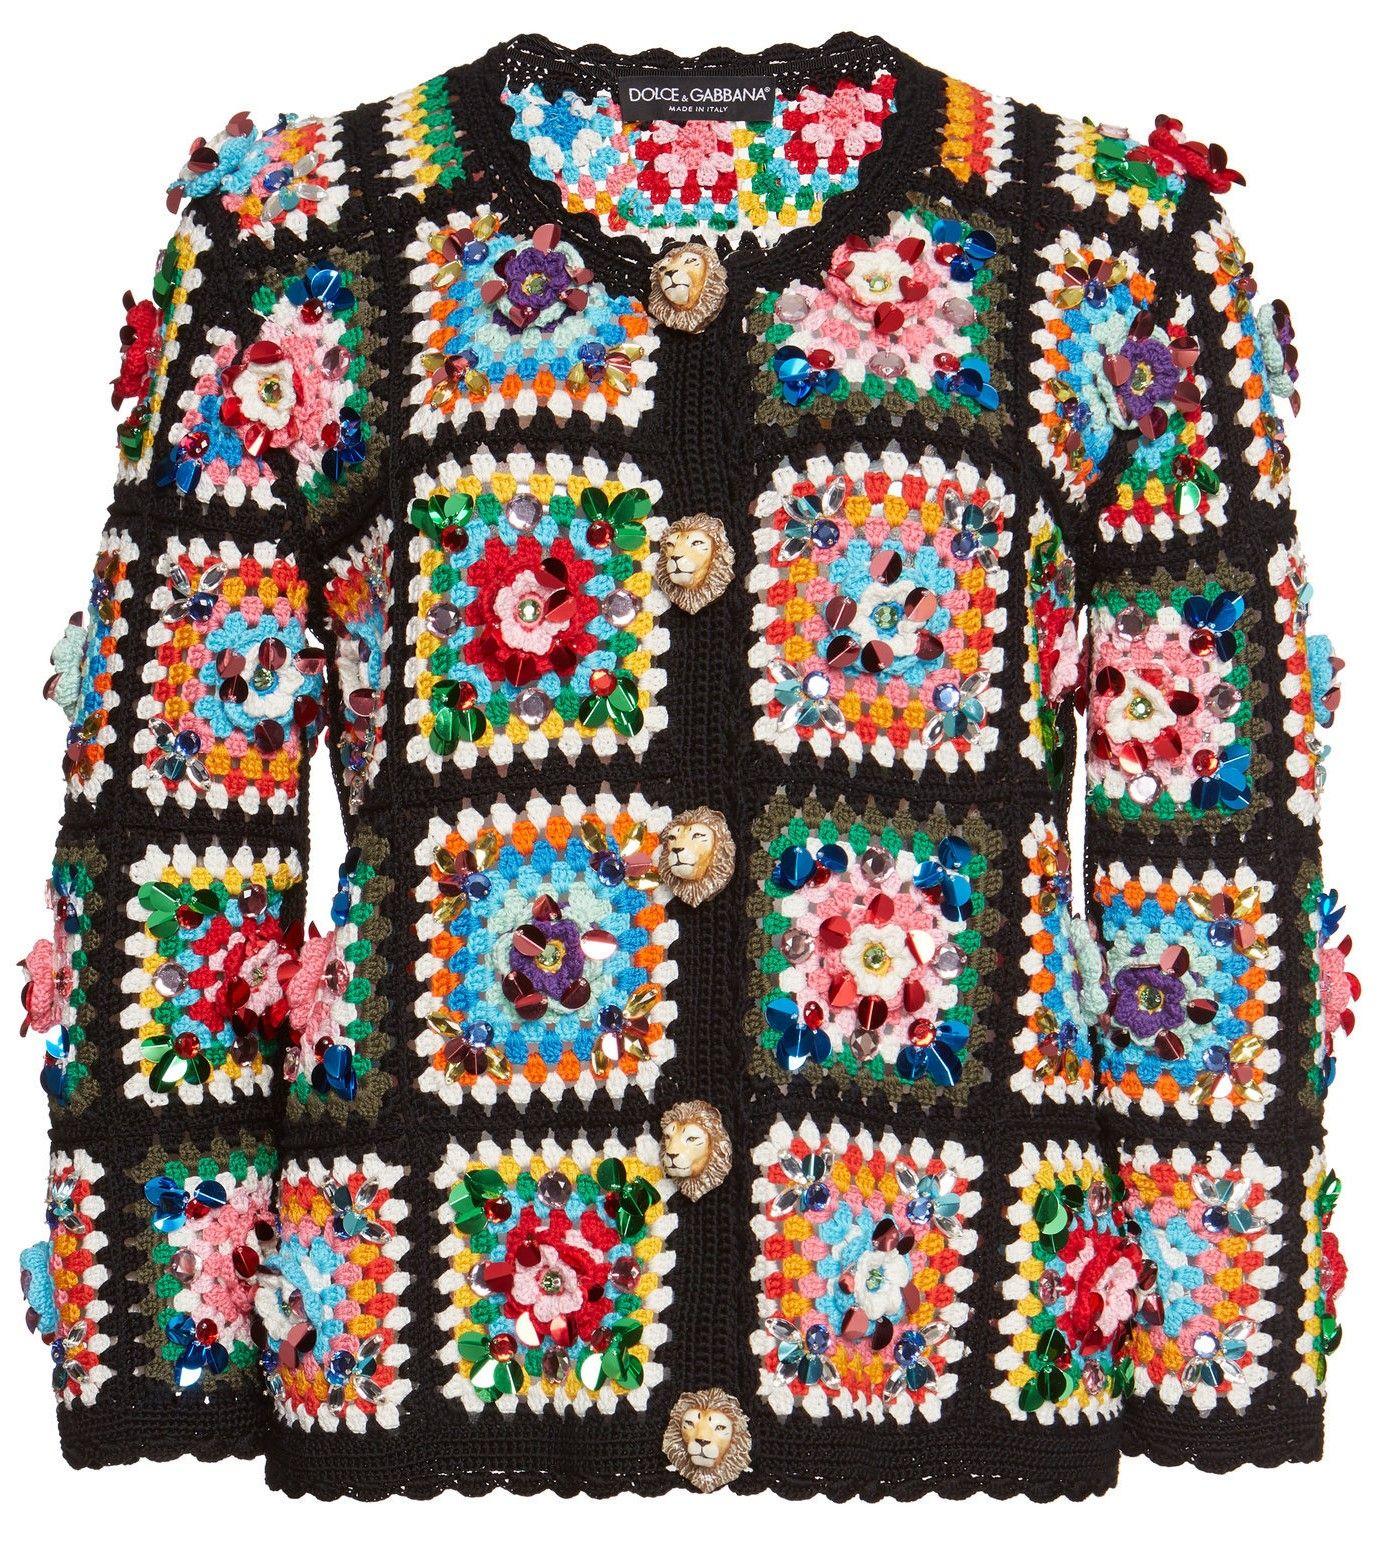 Dolce Gabbana Hand Woven Knit Jacket Frida Blanket Crochet